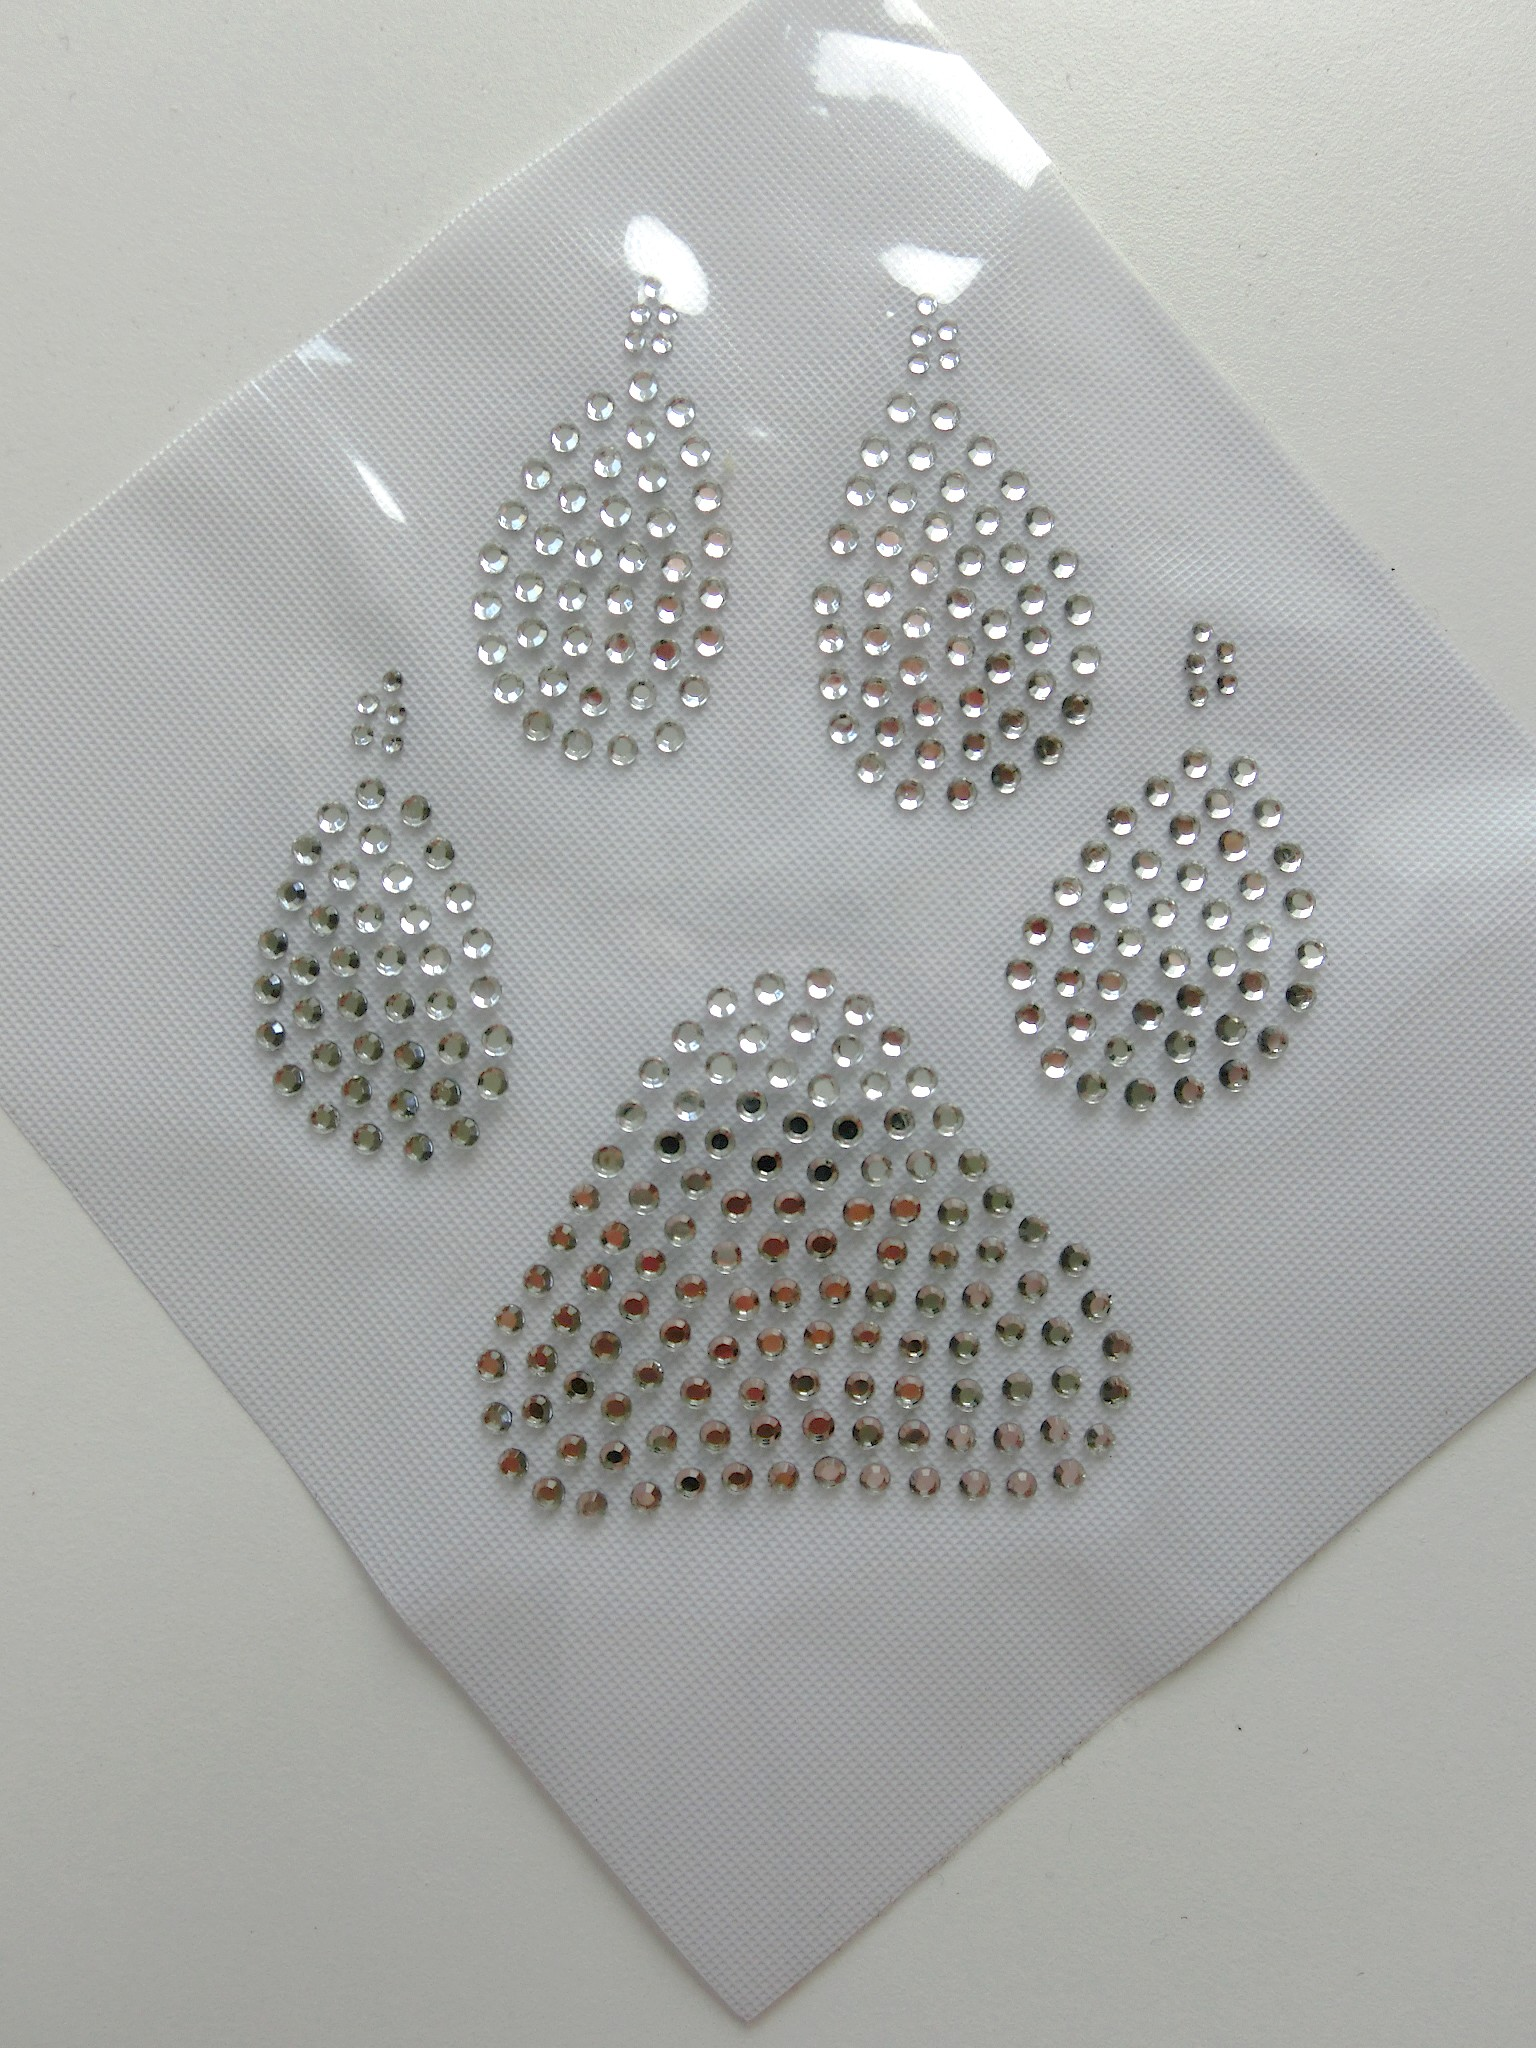 Zauber-Strass - 1 große Hunde Pfote Strass Hotfix Bügelbild Crystal süß